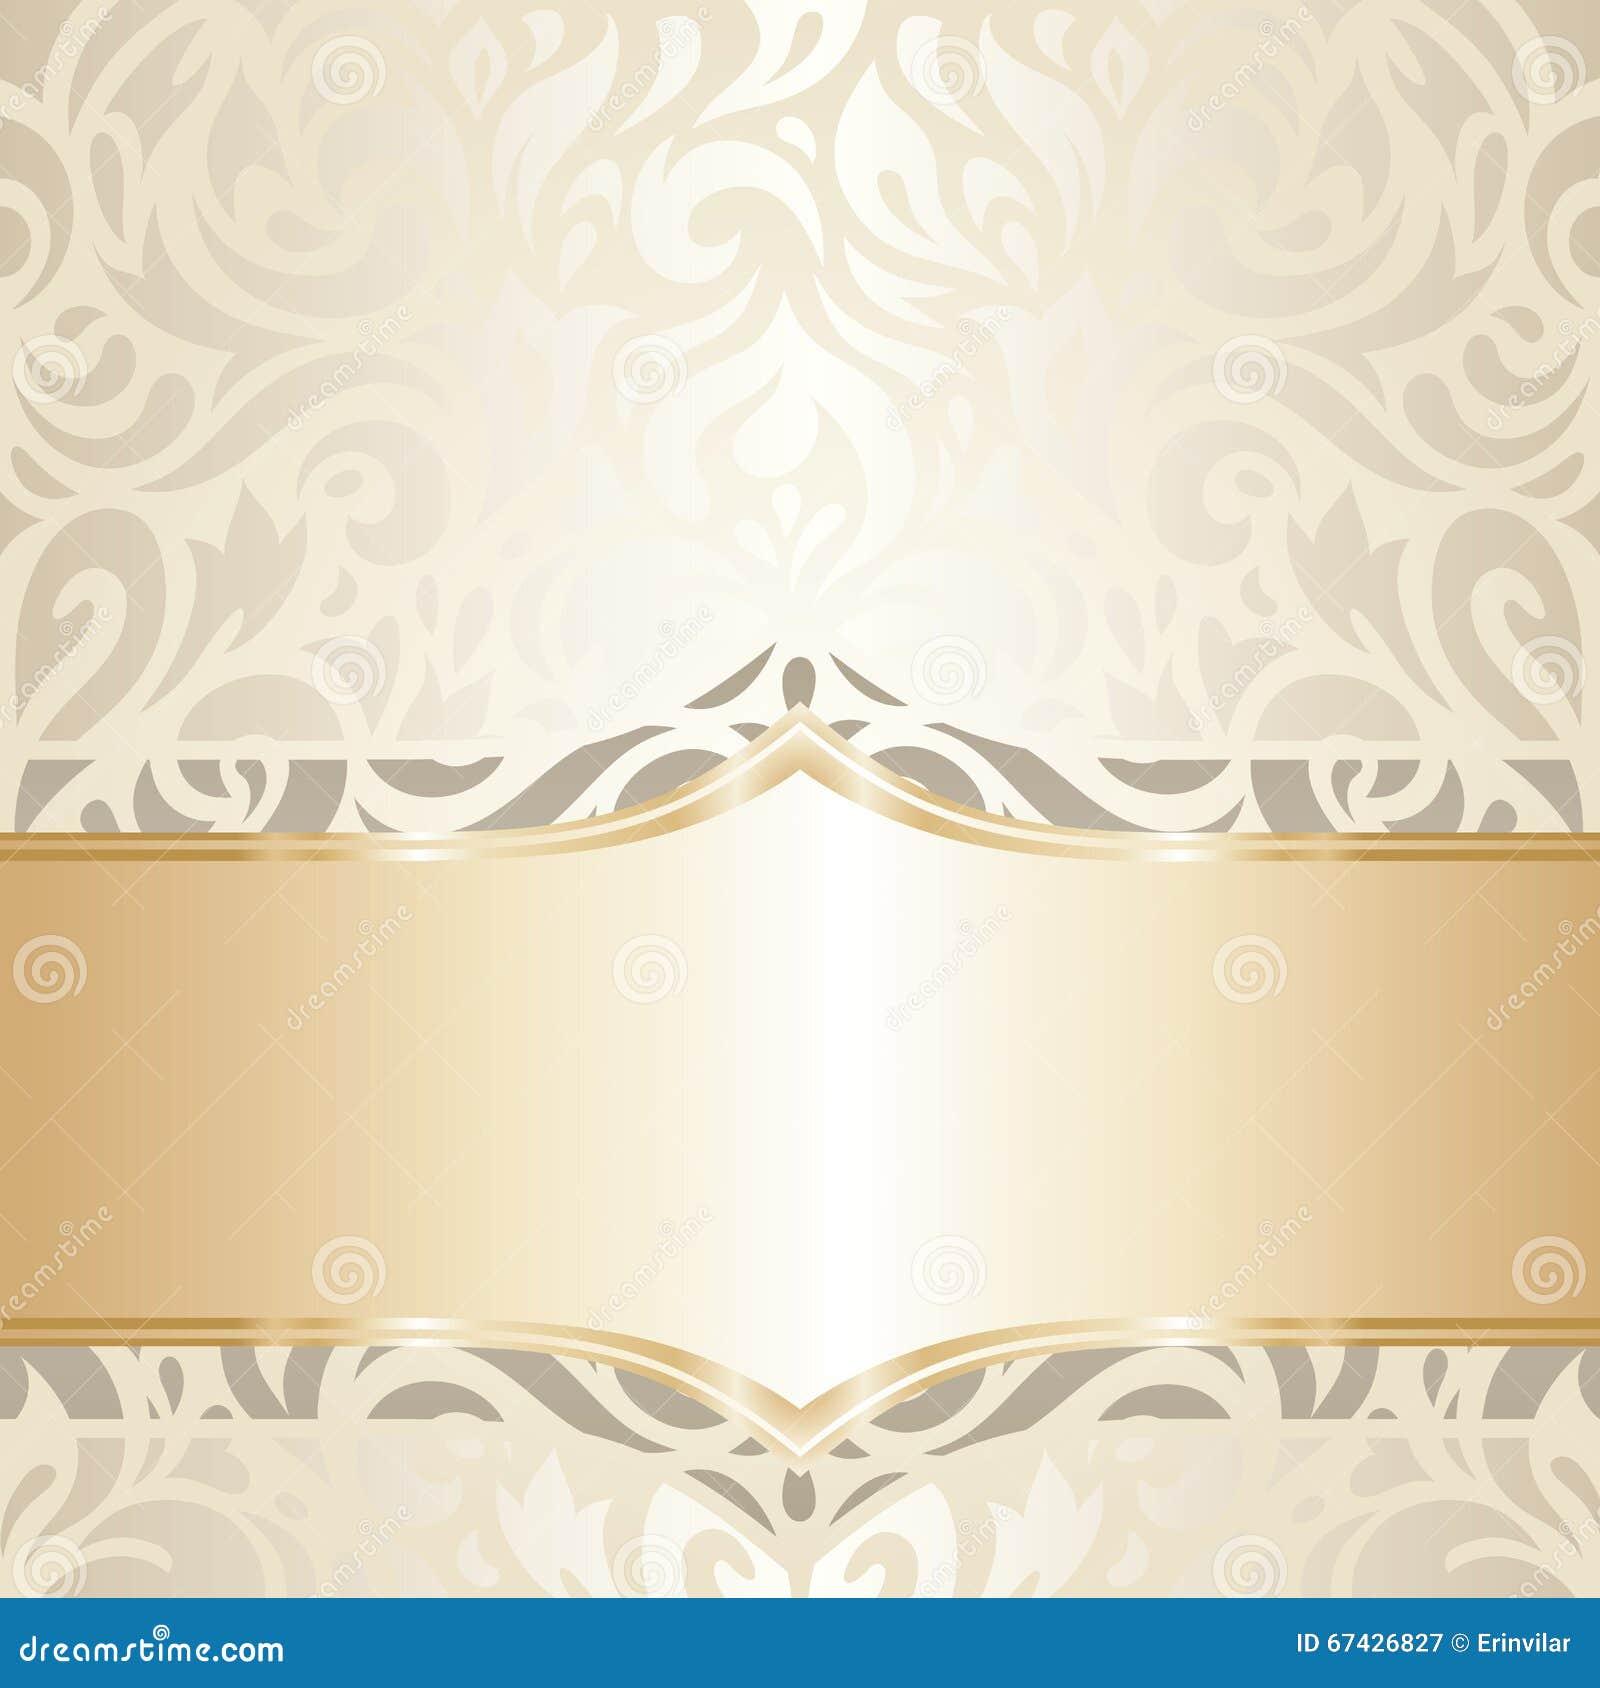 Wedding Vintage Wallpaper Design White & Gold Vector Stock ...